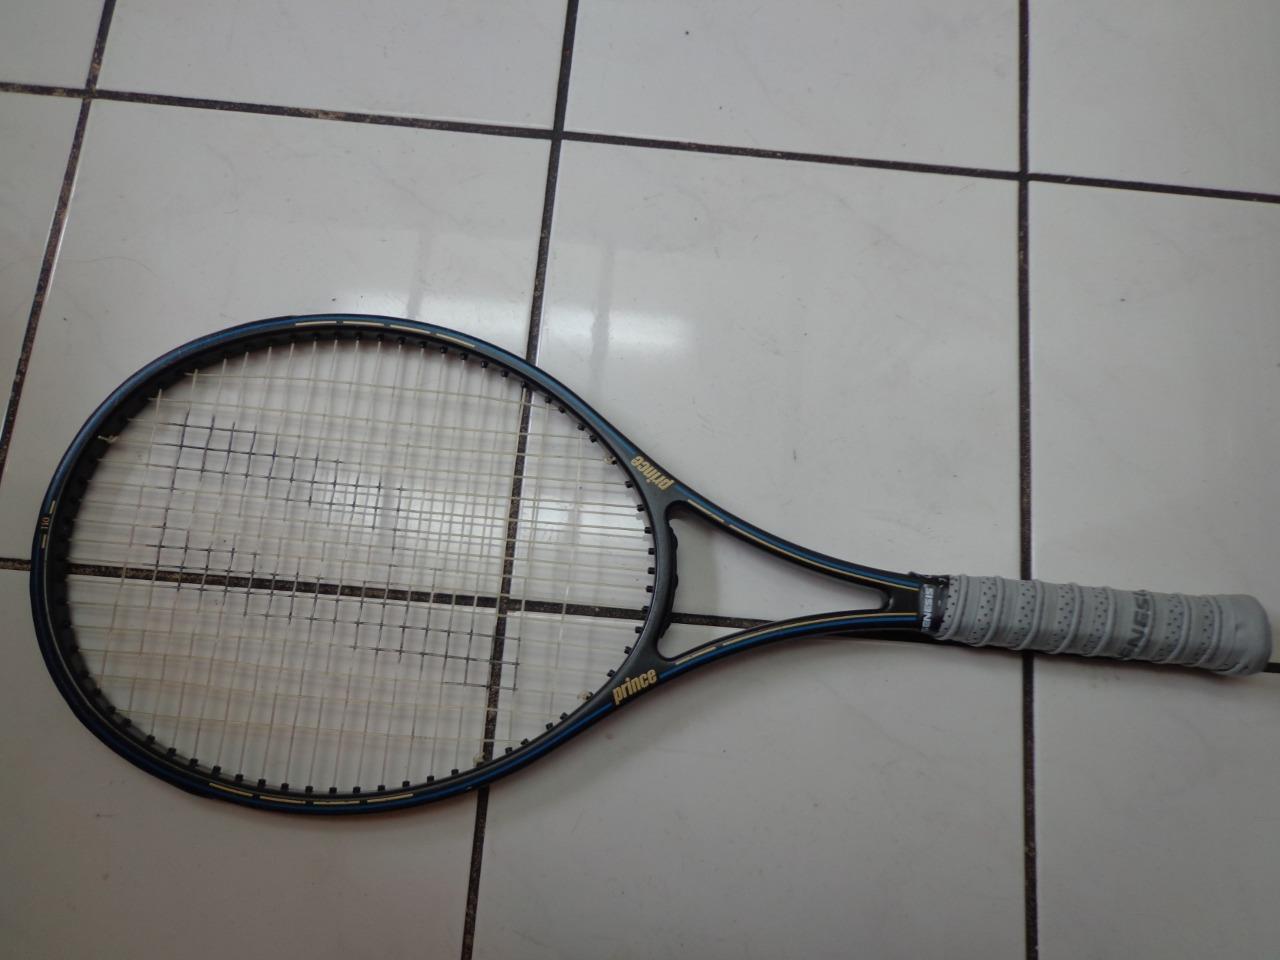 Prince Graphite Supreme 110 head 4 5 8 grip Tennis Racquet